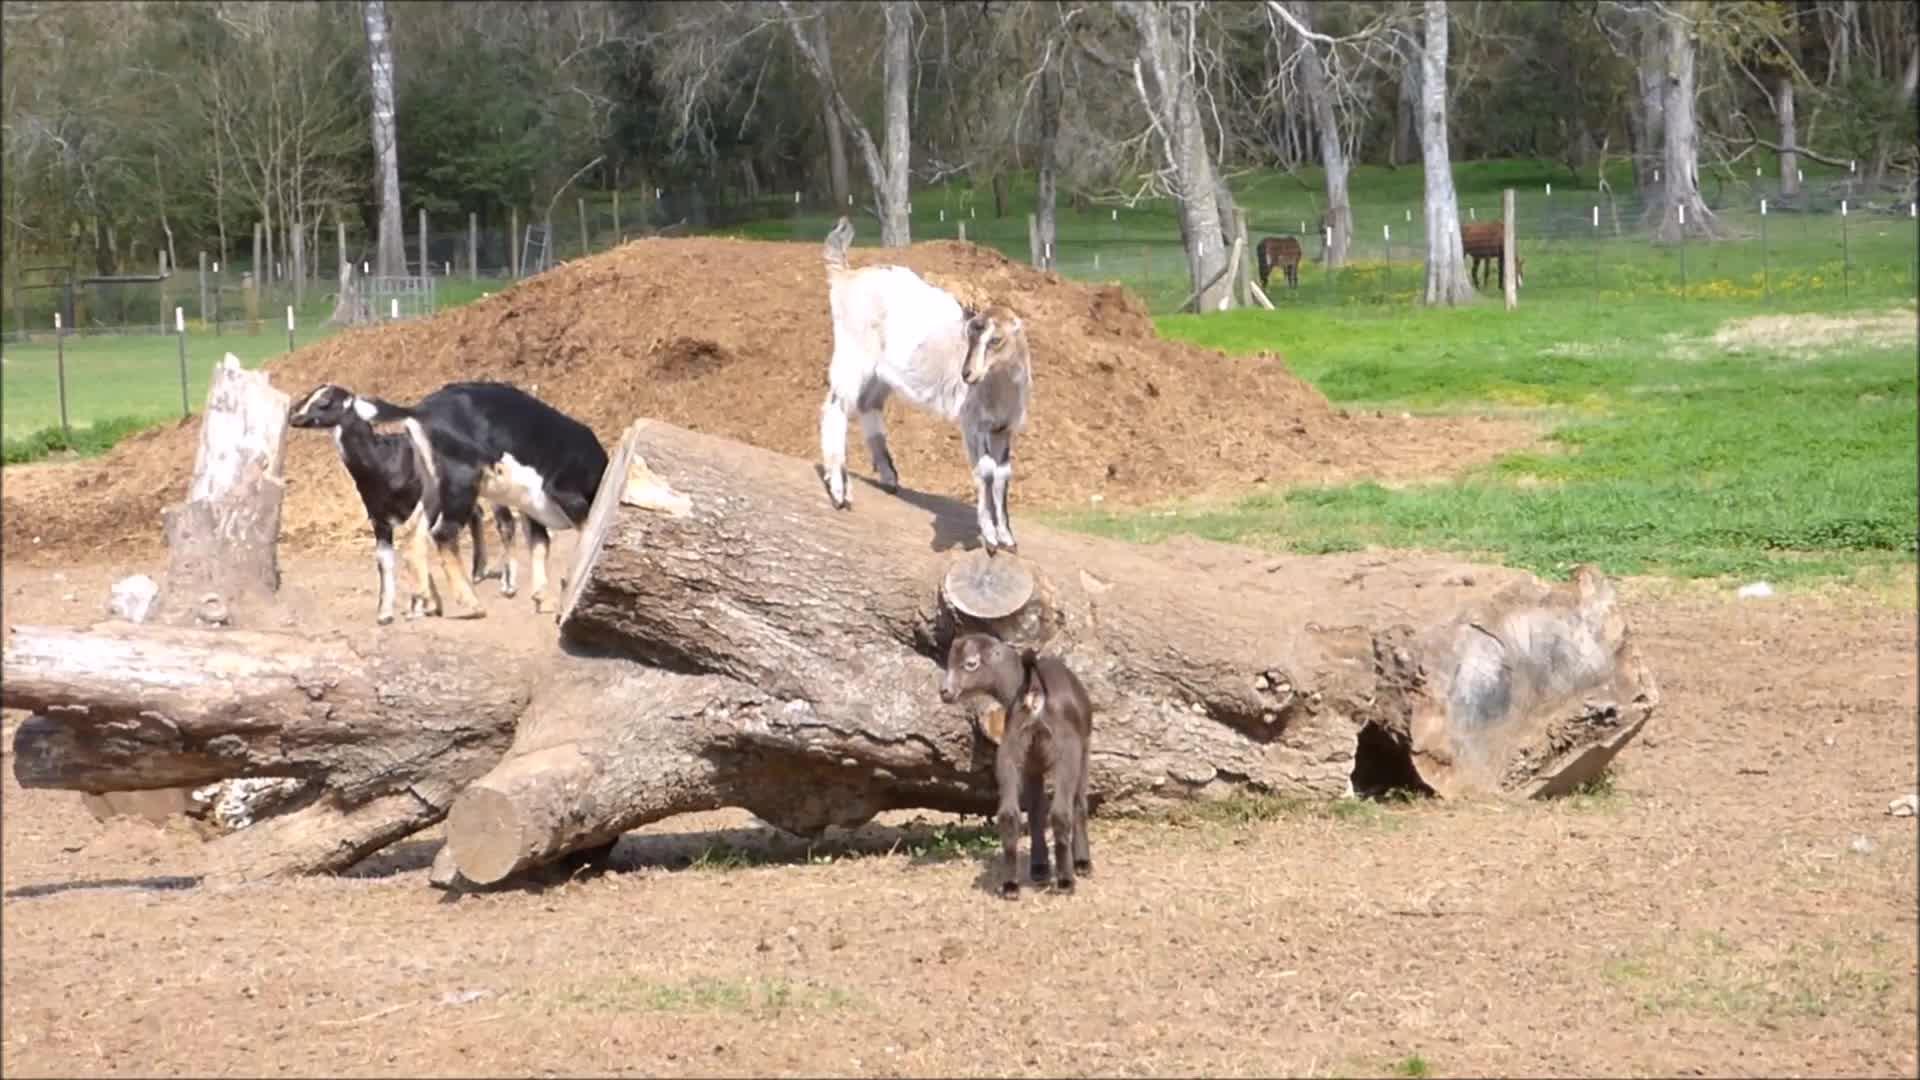 aww, cute, funny, goatparkour, knsfarm, Bro that was awesome GIFs